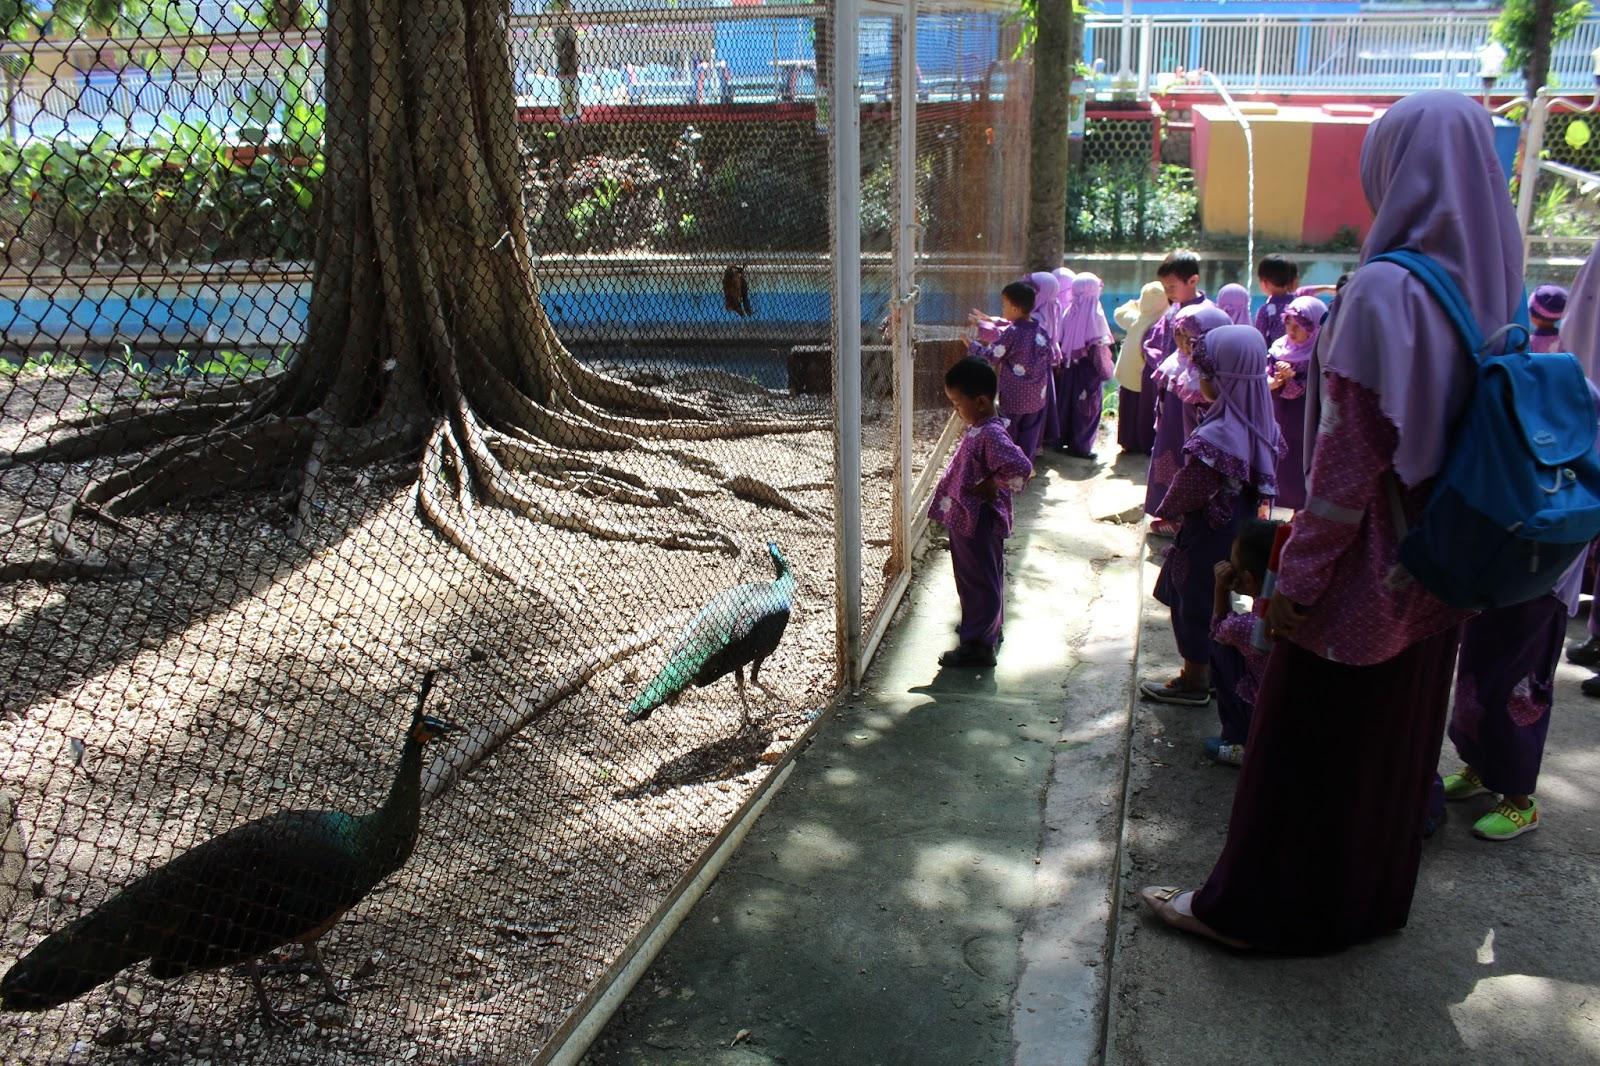 Asiknya Mengenal Aneka Burung Langka Taman Tirtonadi Blora Anak Tk